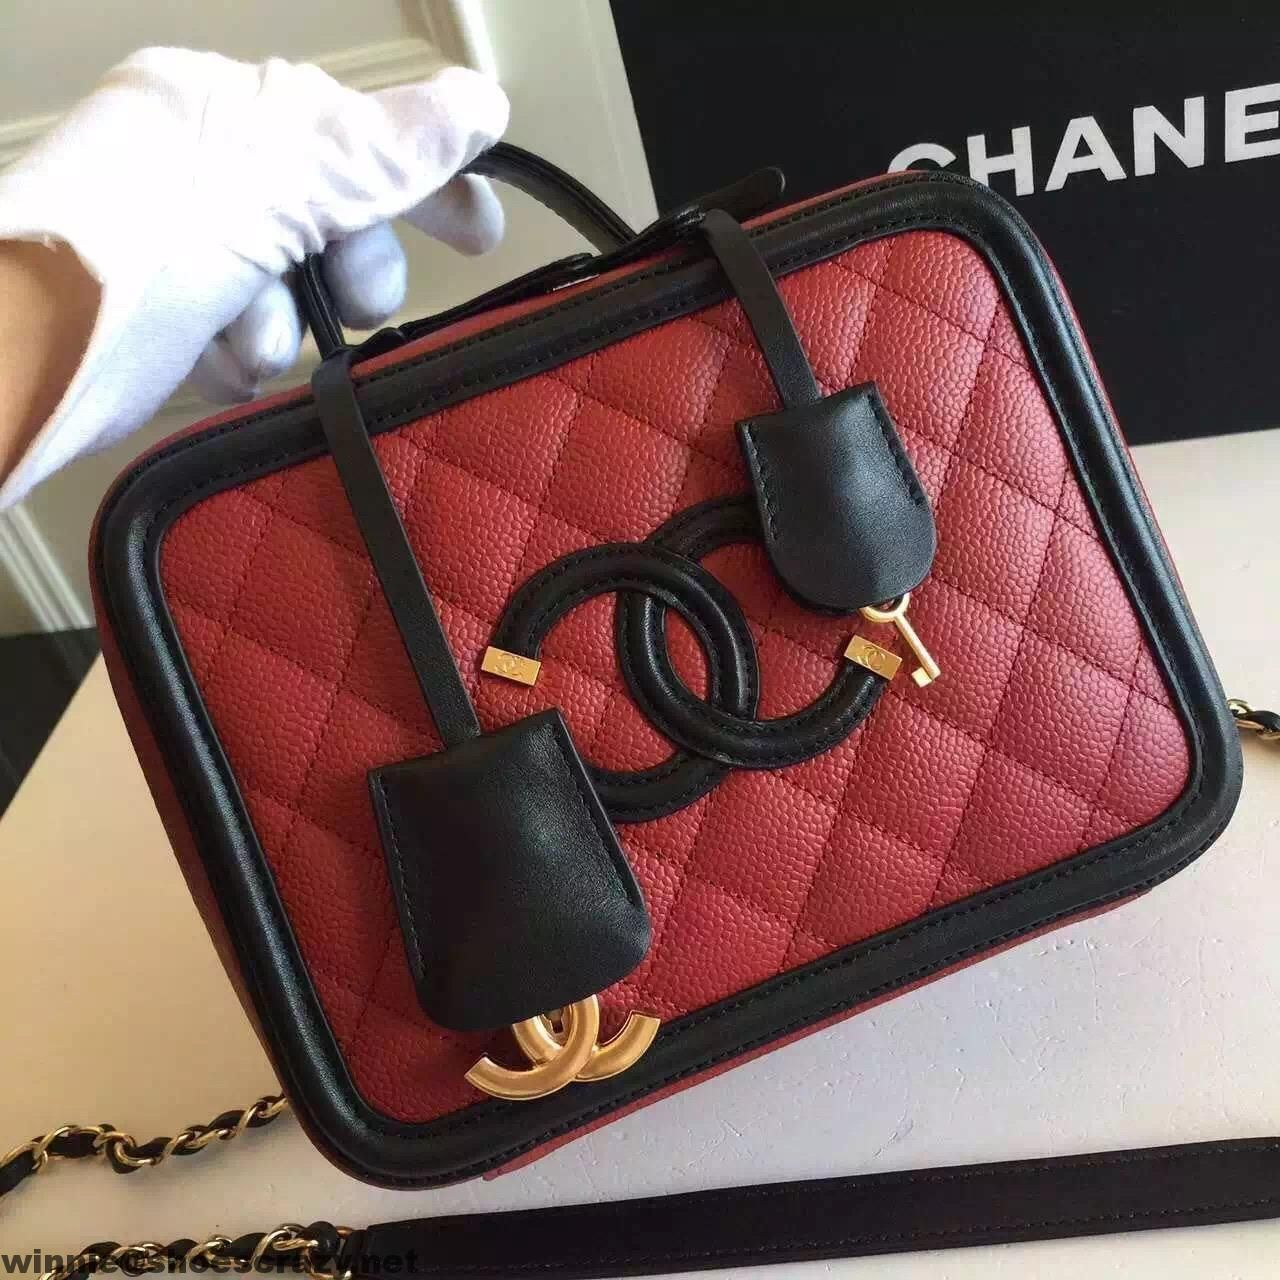 chanel vanity case. chanel cc filigree small vanity case bag i